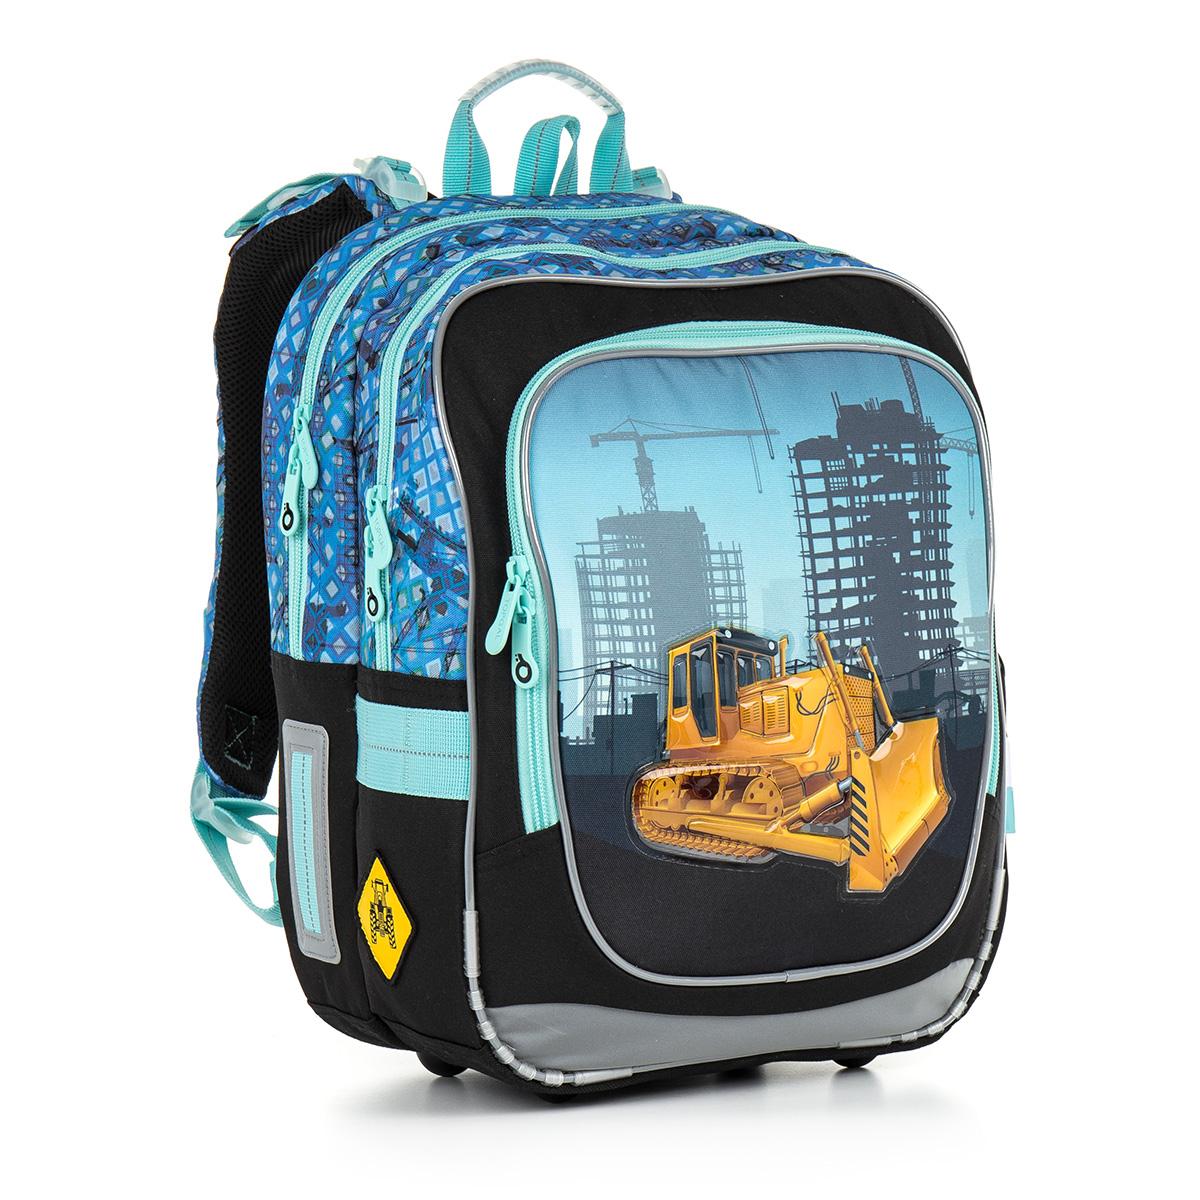 Topgal školni batoh CHI 877 D - Blue